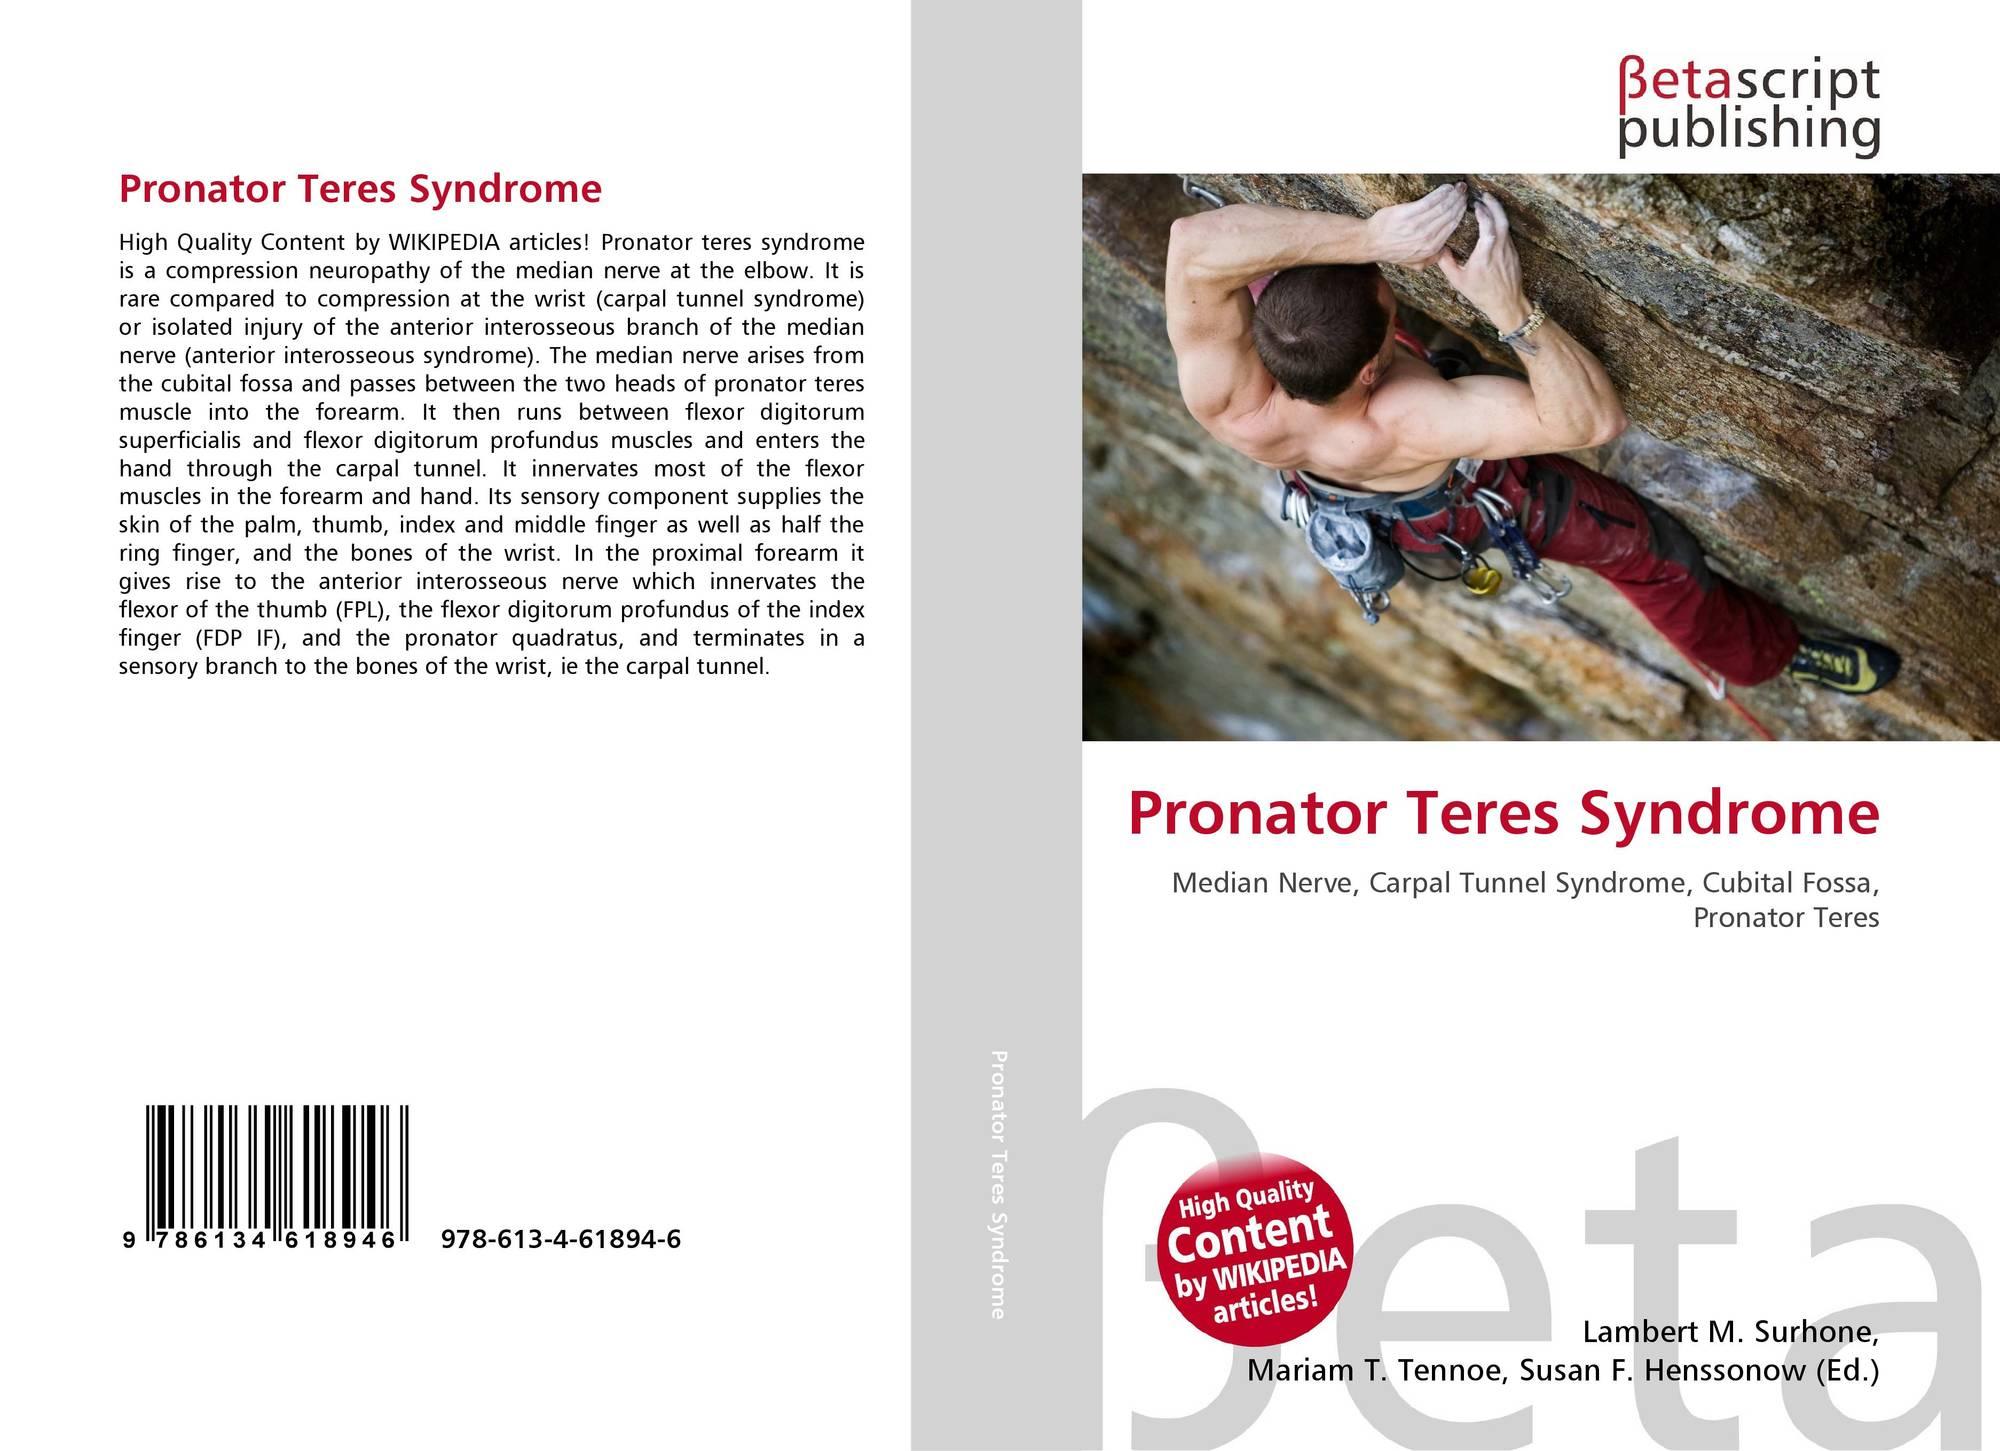 Pronator Teres Syndrome, 978-613-4-61894-6, - 265.4KB